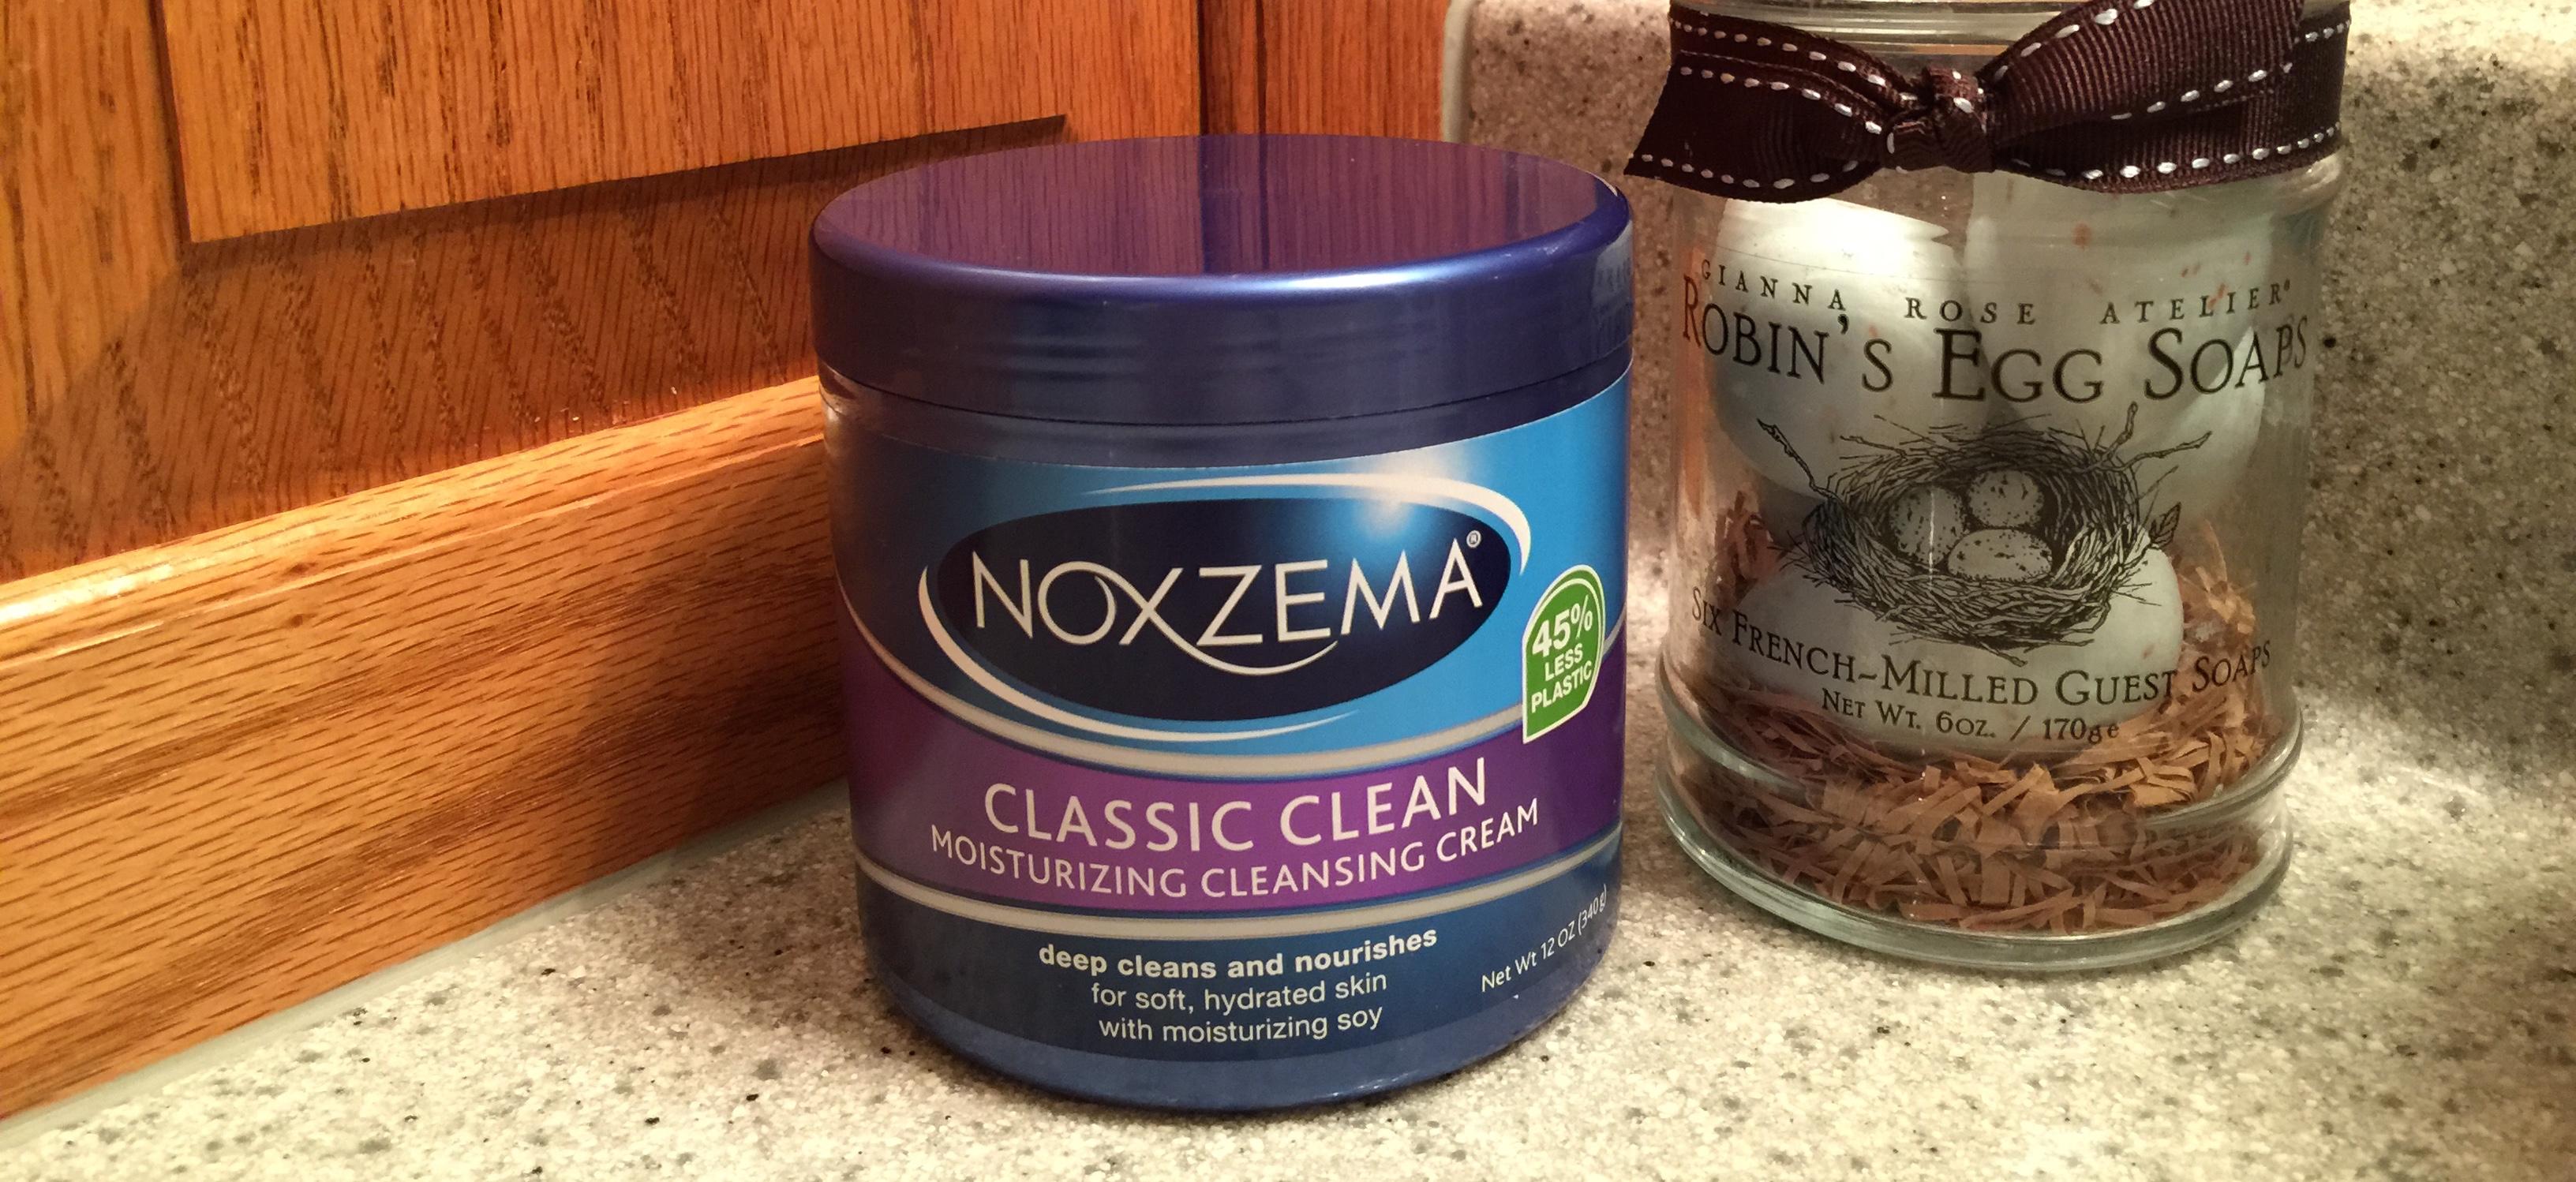 Noxzema Moisturizing Cleansing Cream